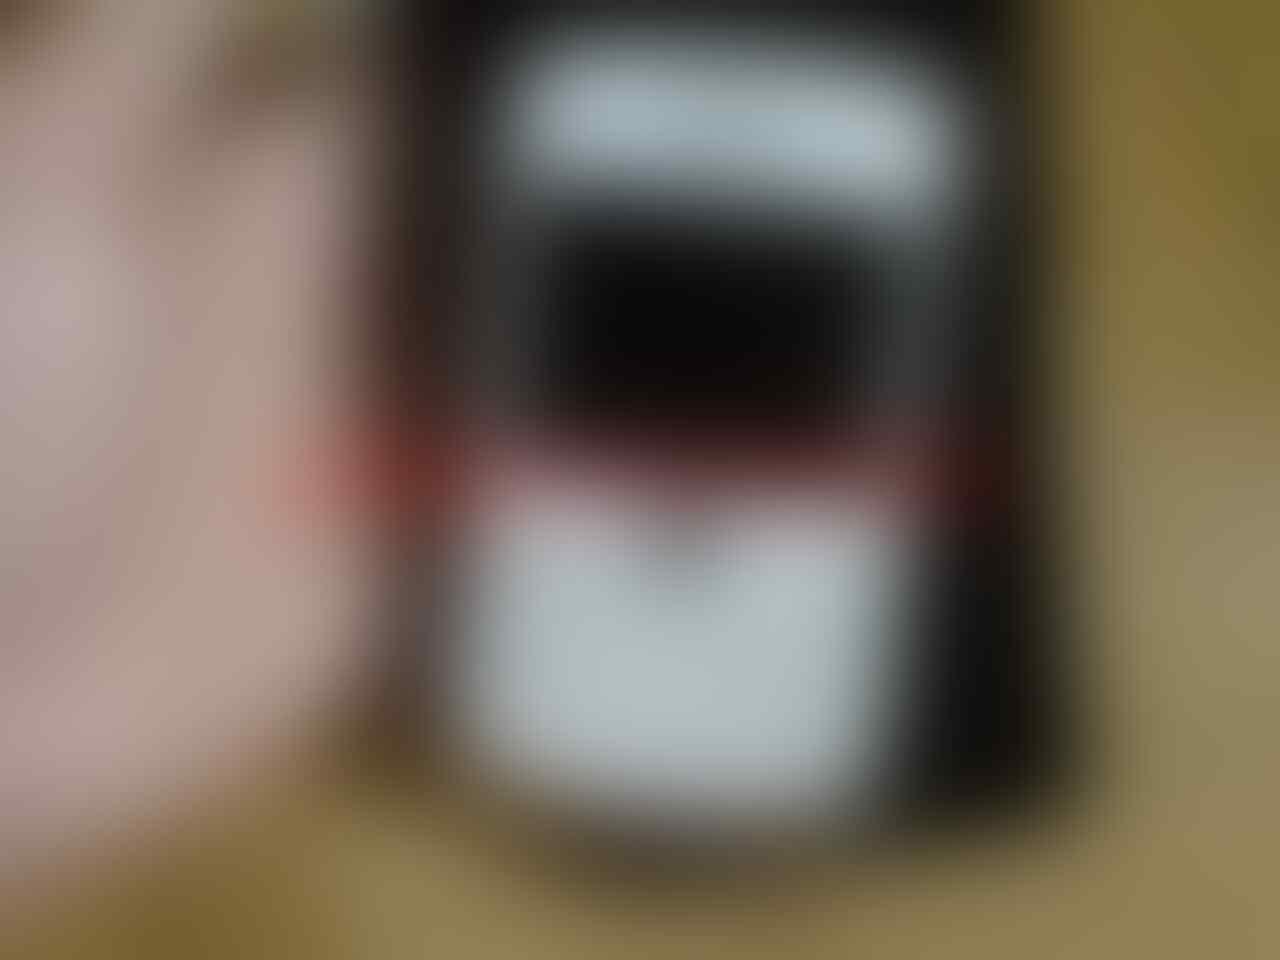 Blackberry Onyx 9700 white & Bold 9000 White [ MATI TOTAL / RUSAK / ERROR / MATOT ]